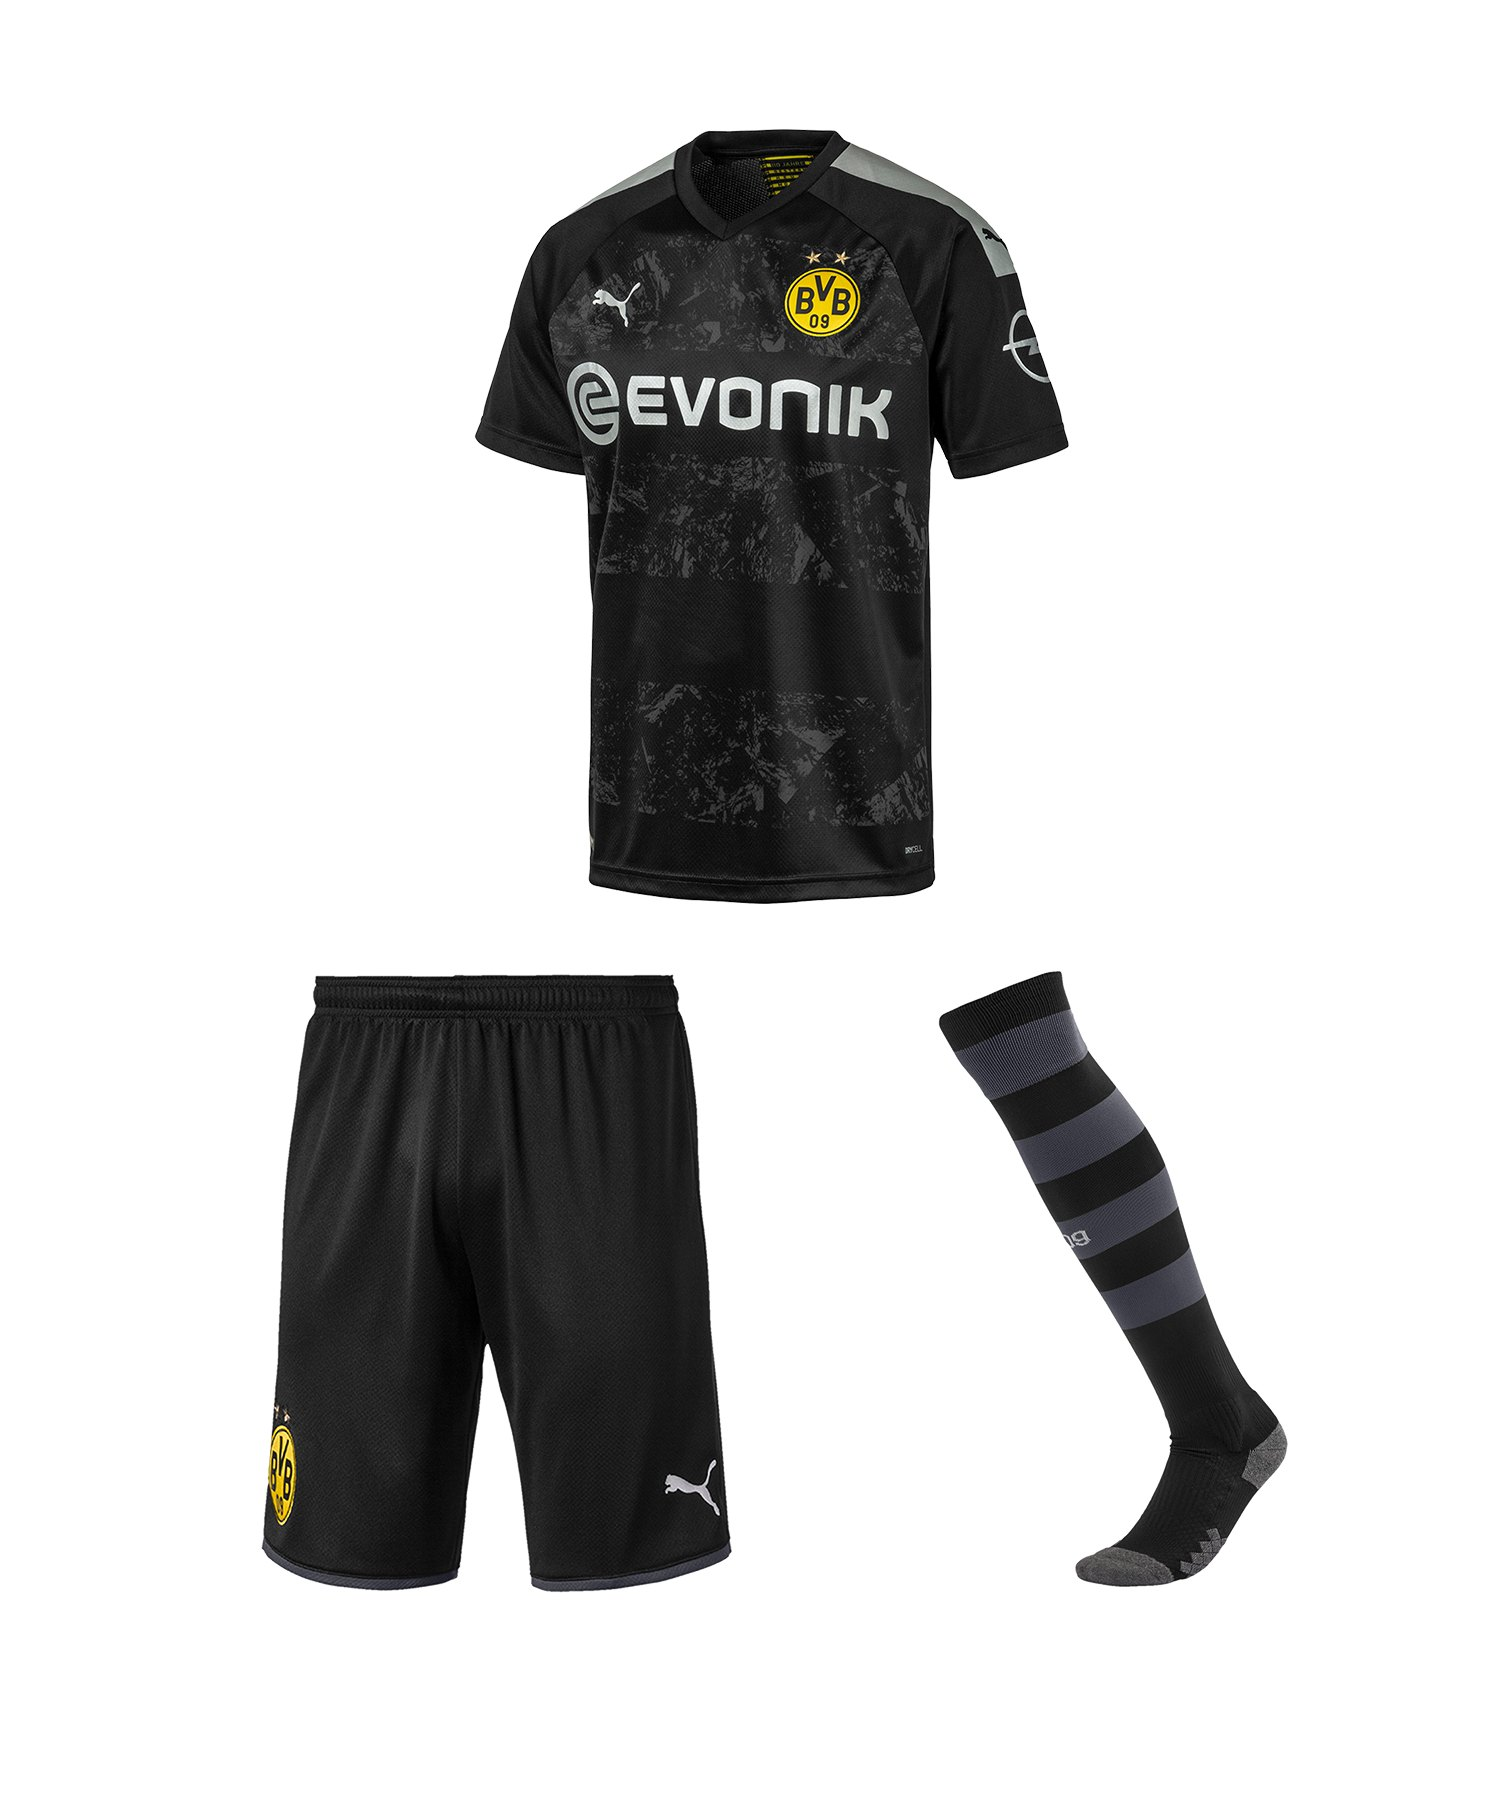 heißer verkauf Details about Puma Football Soccer Borussia